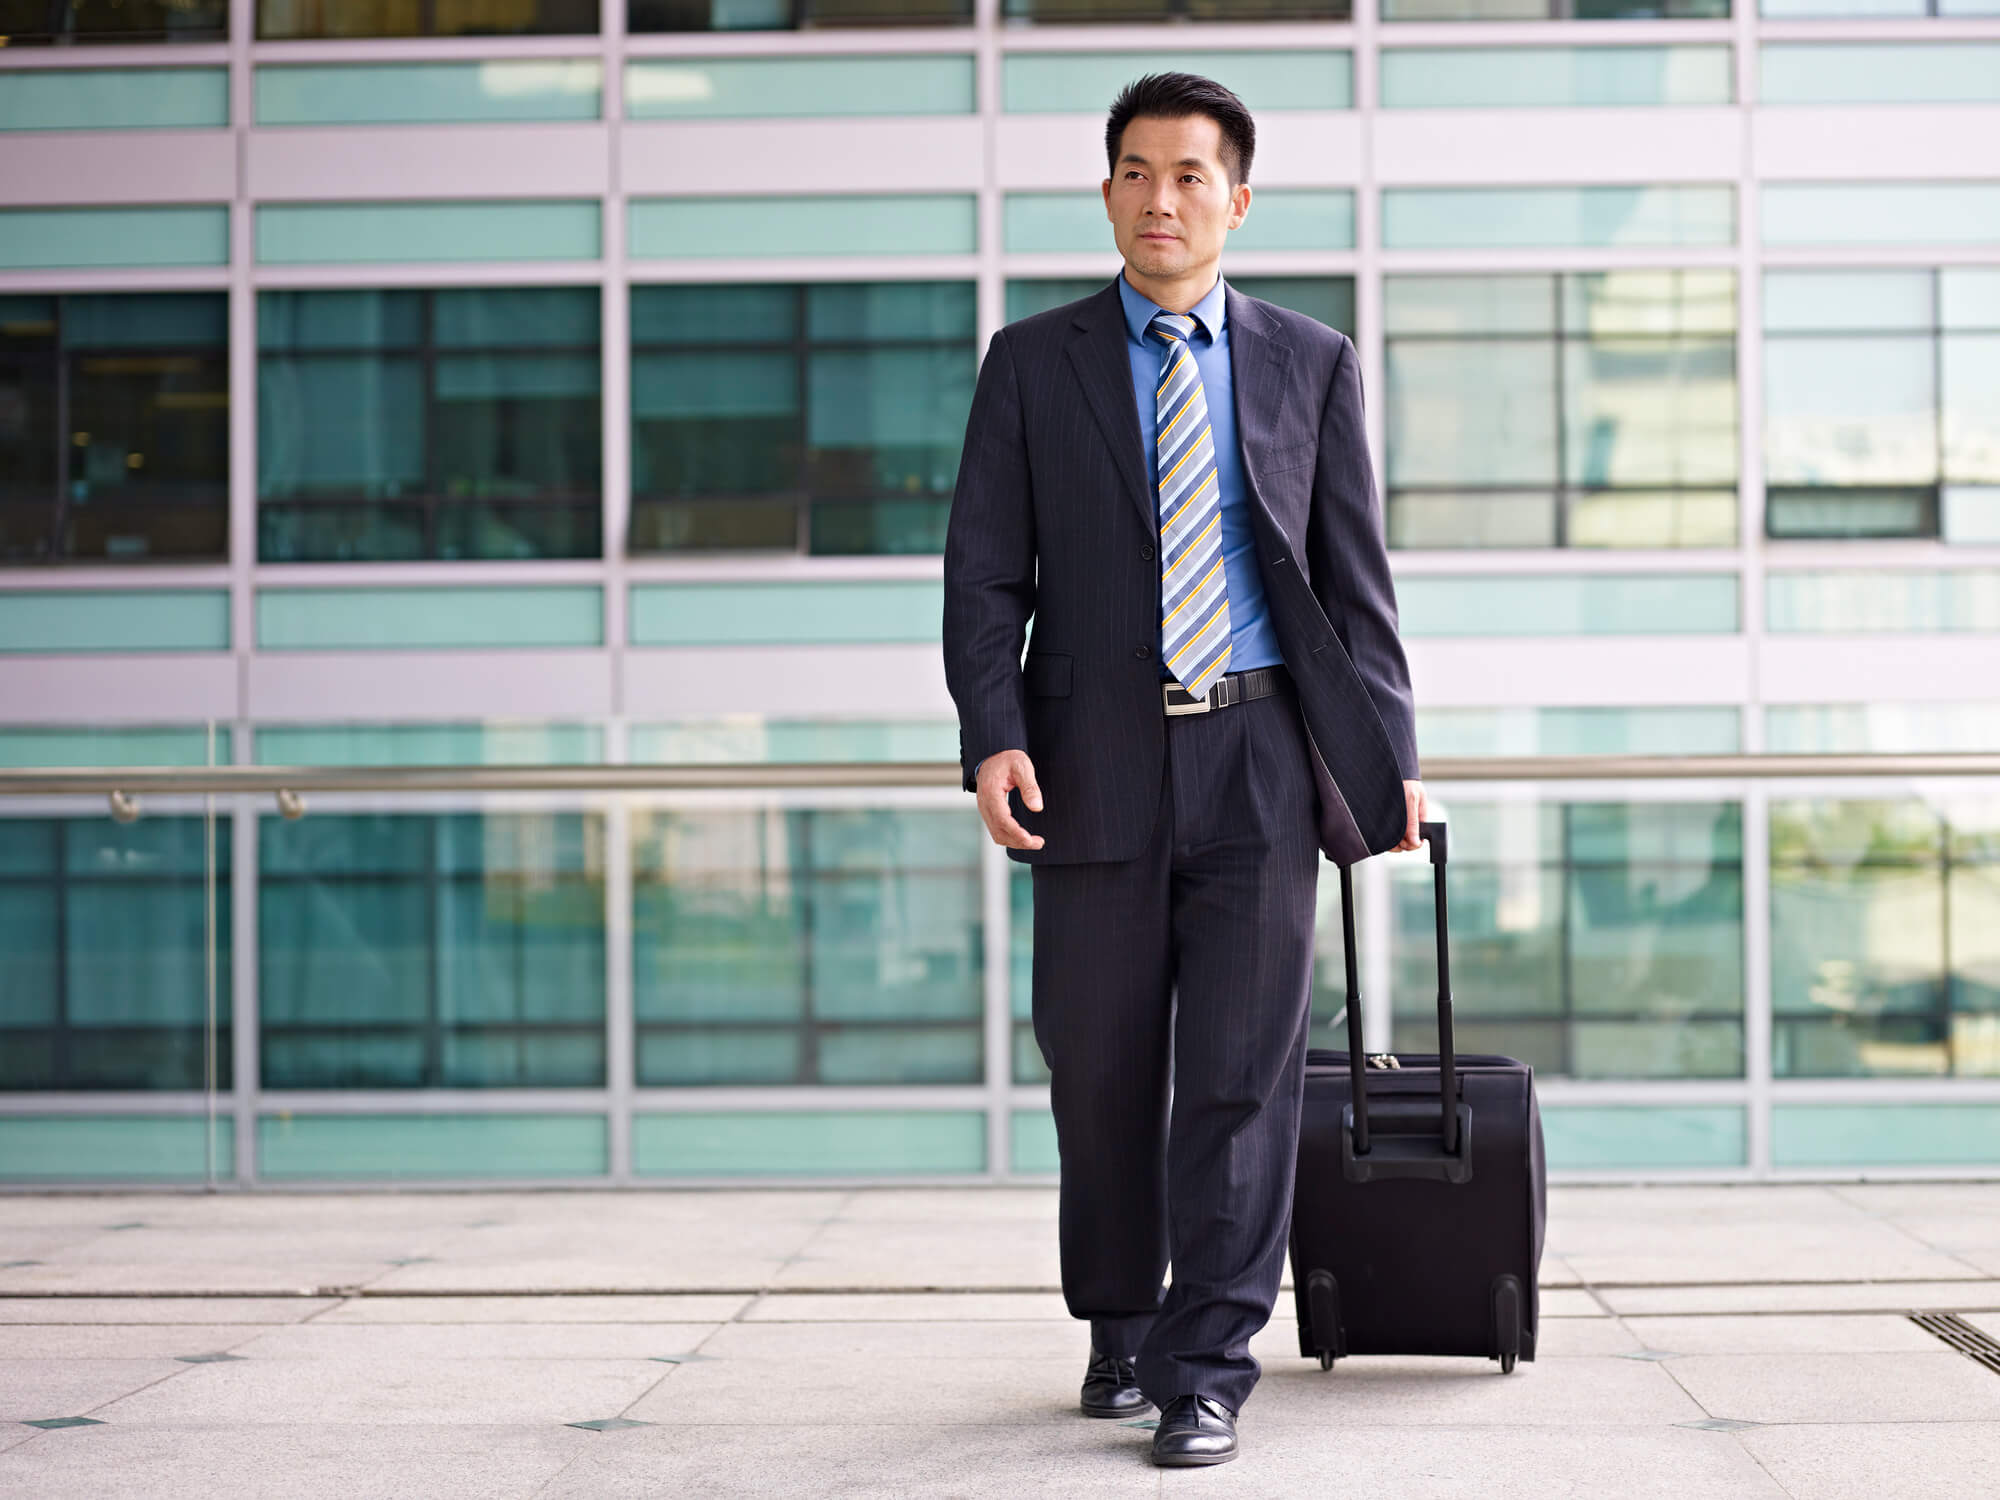 Japanese elites overseas experience